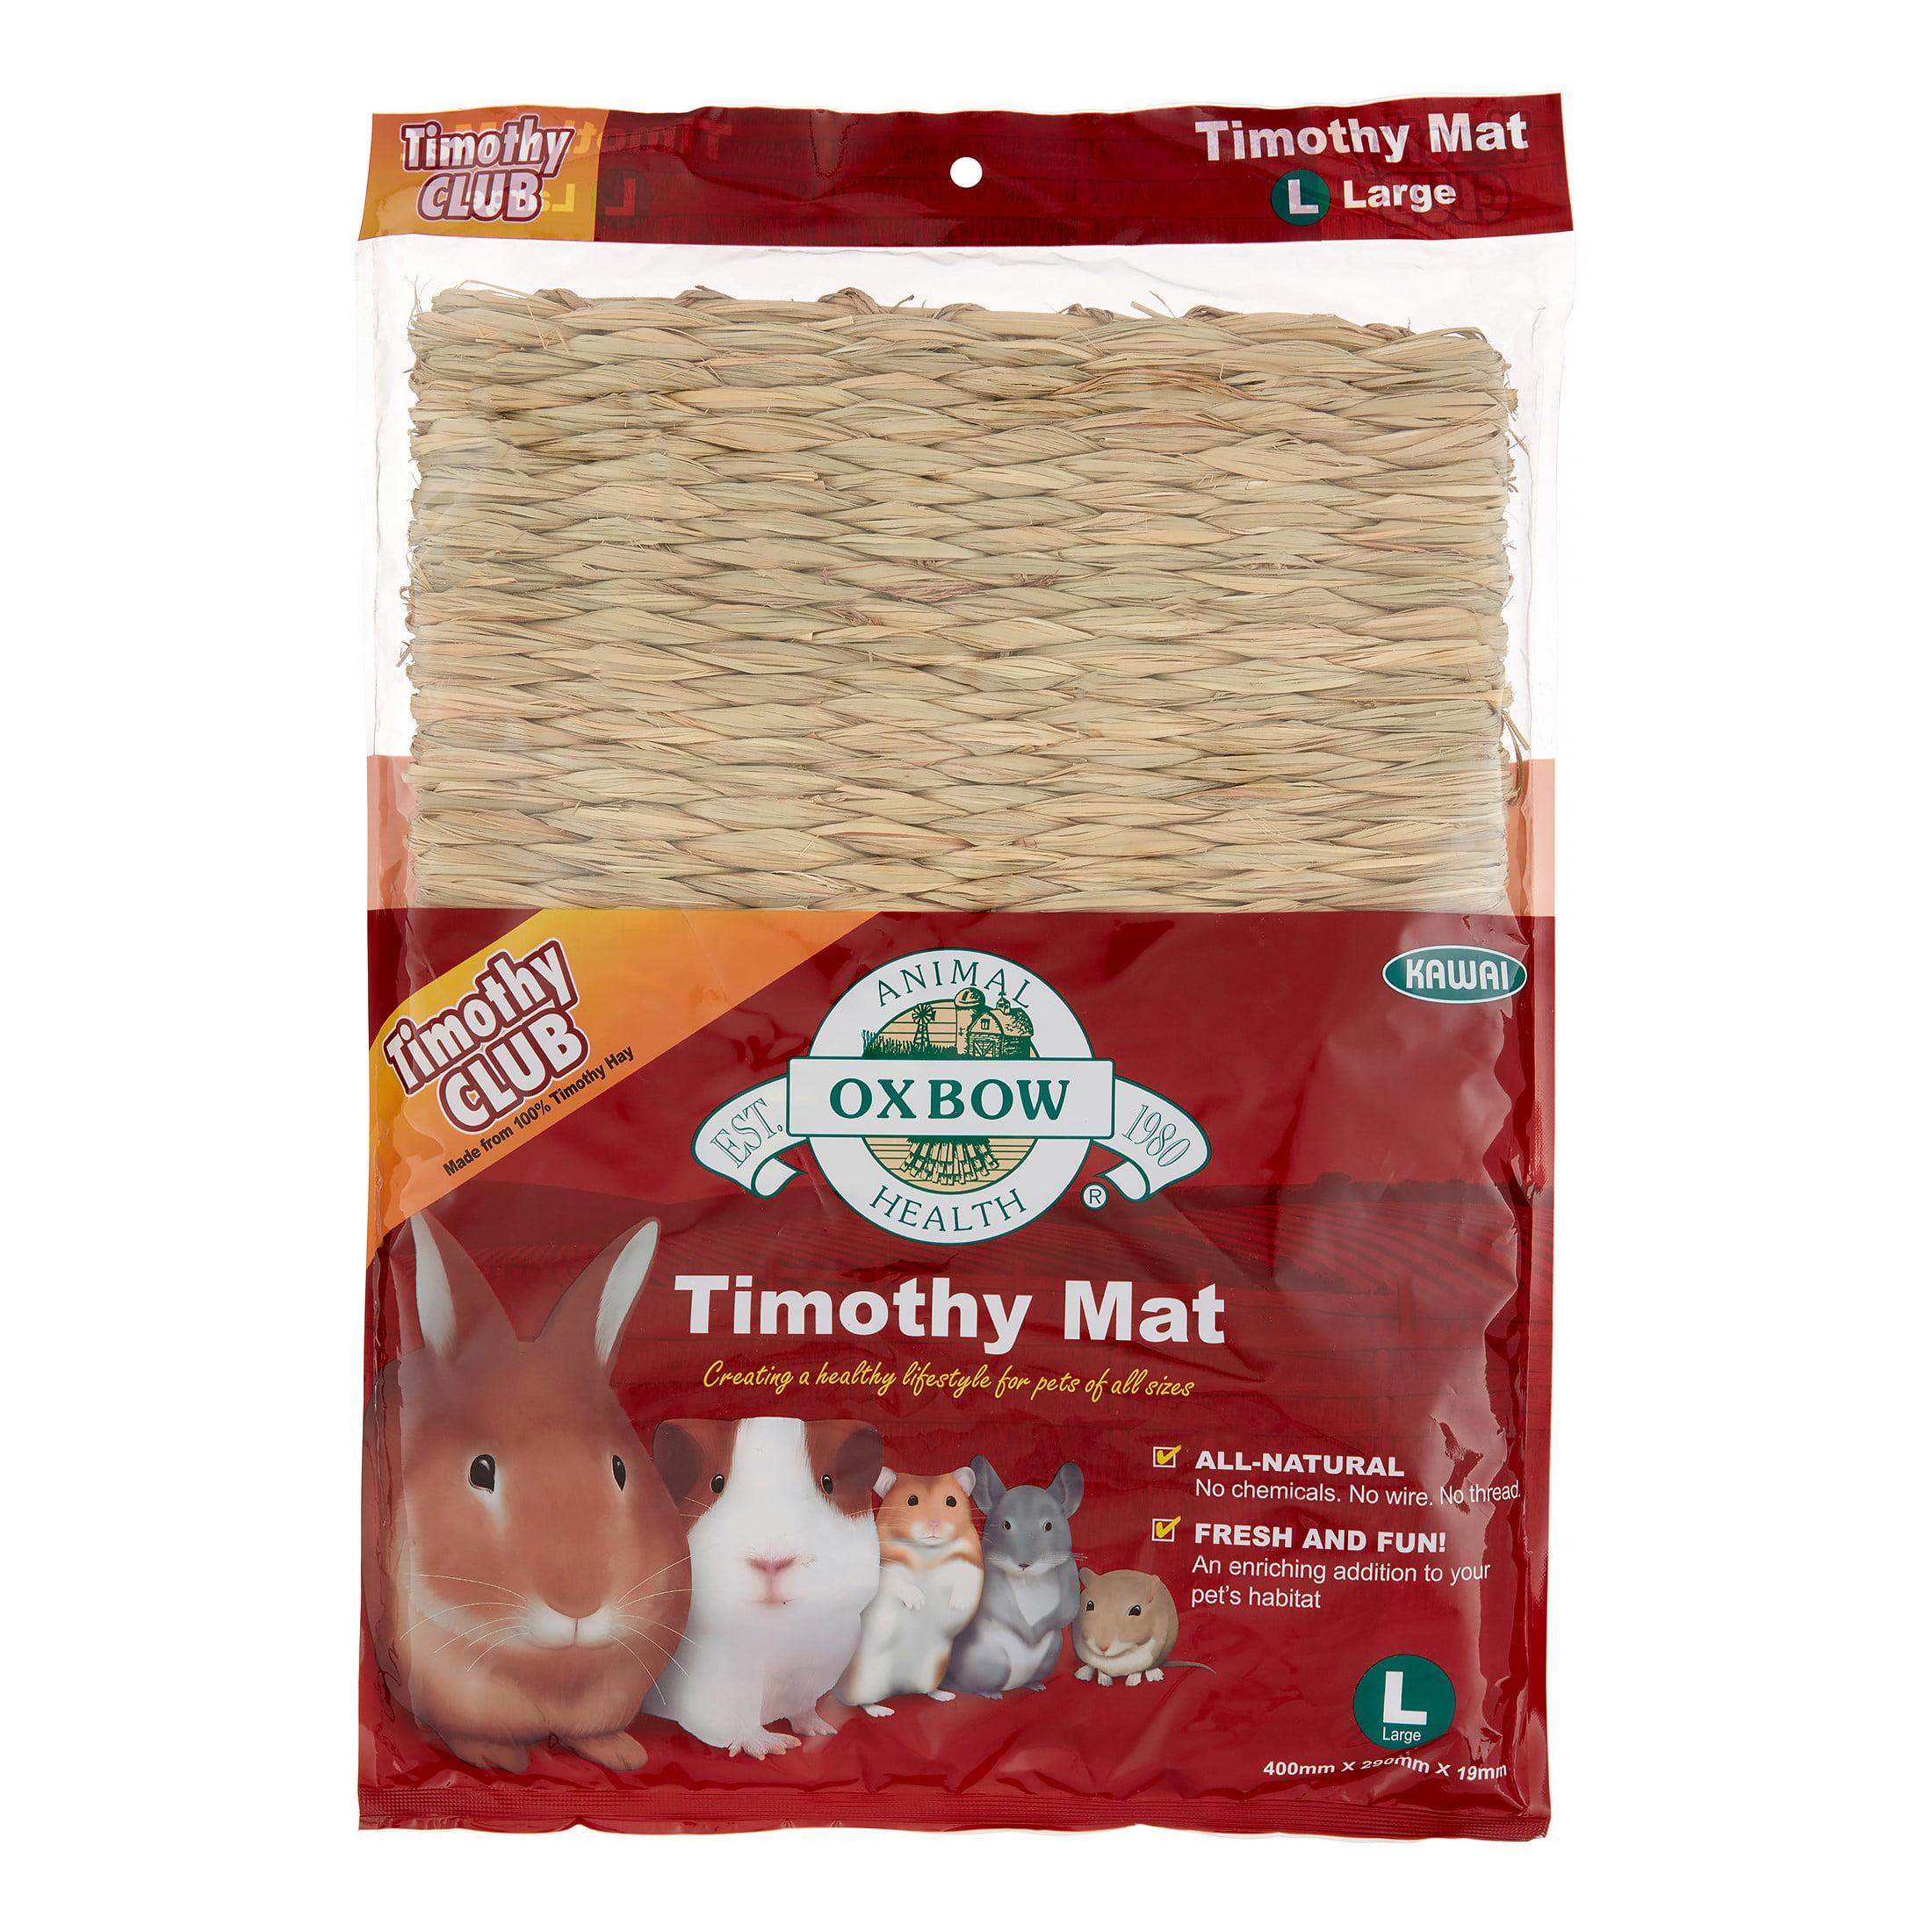 Oxbow Timothy Club Small Animal Mat, Large